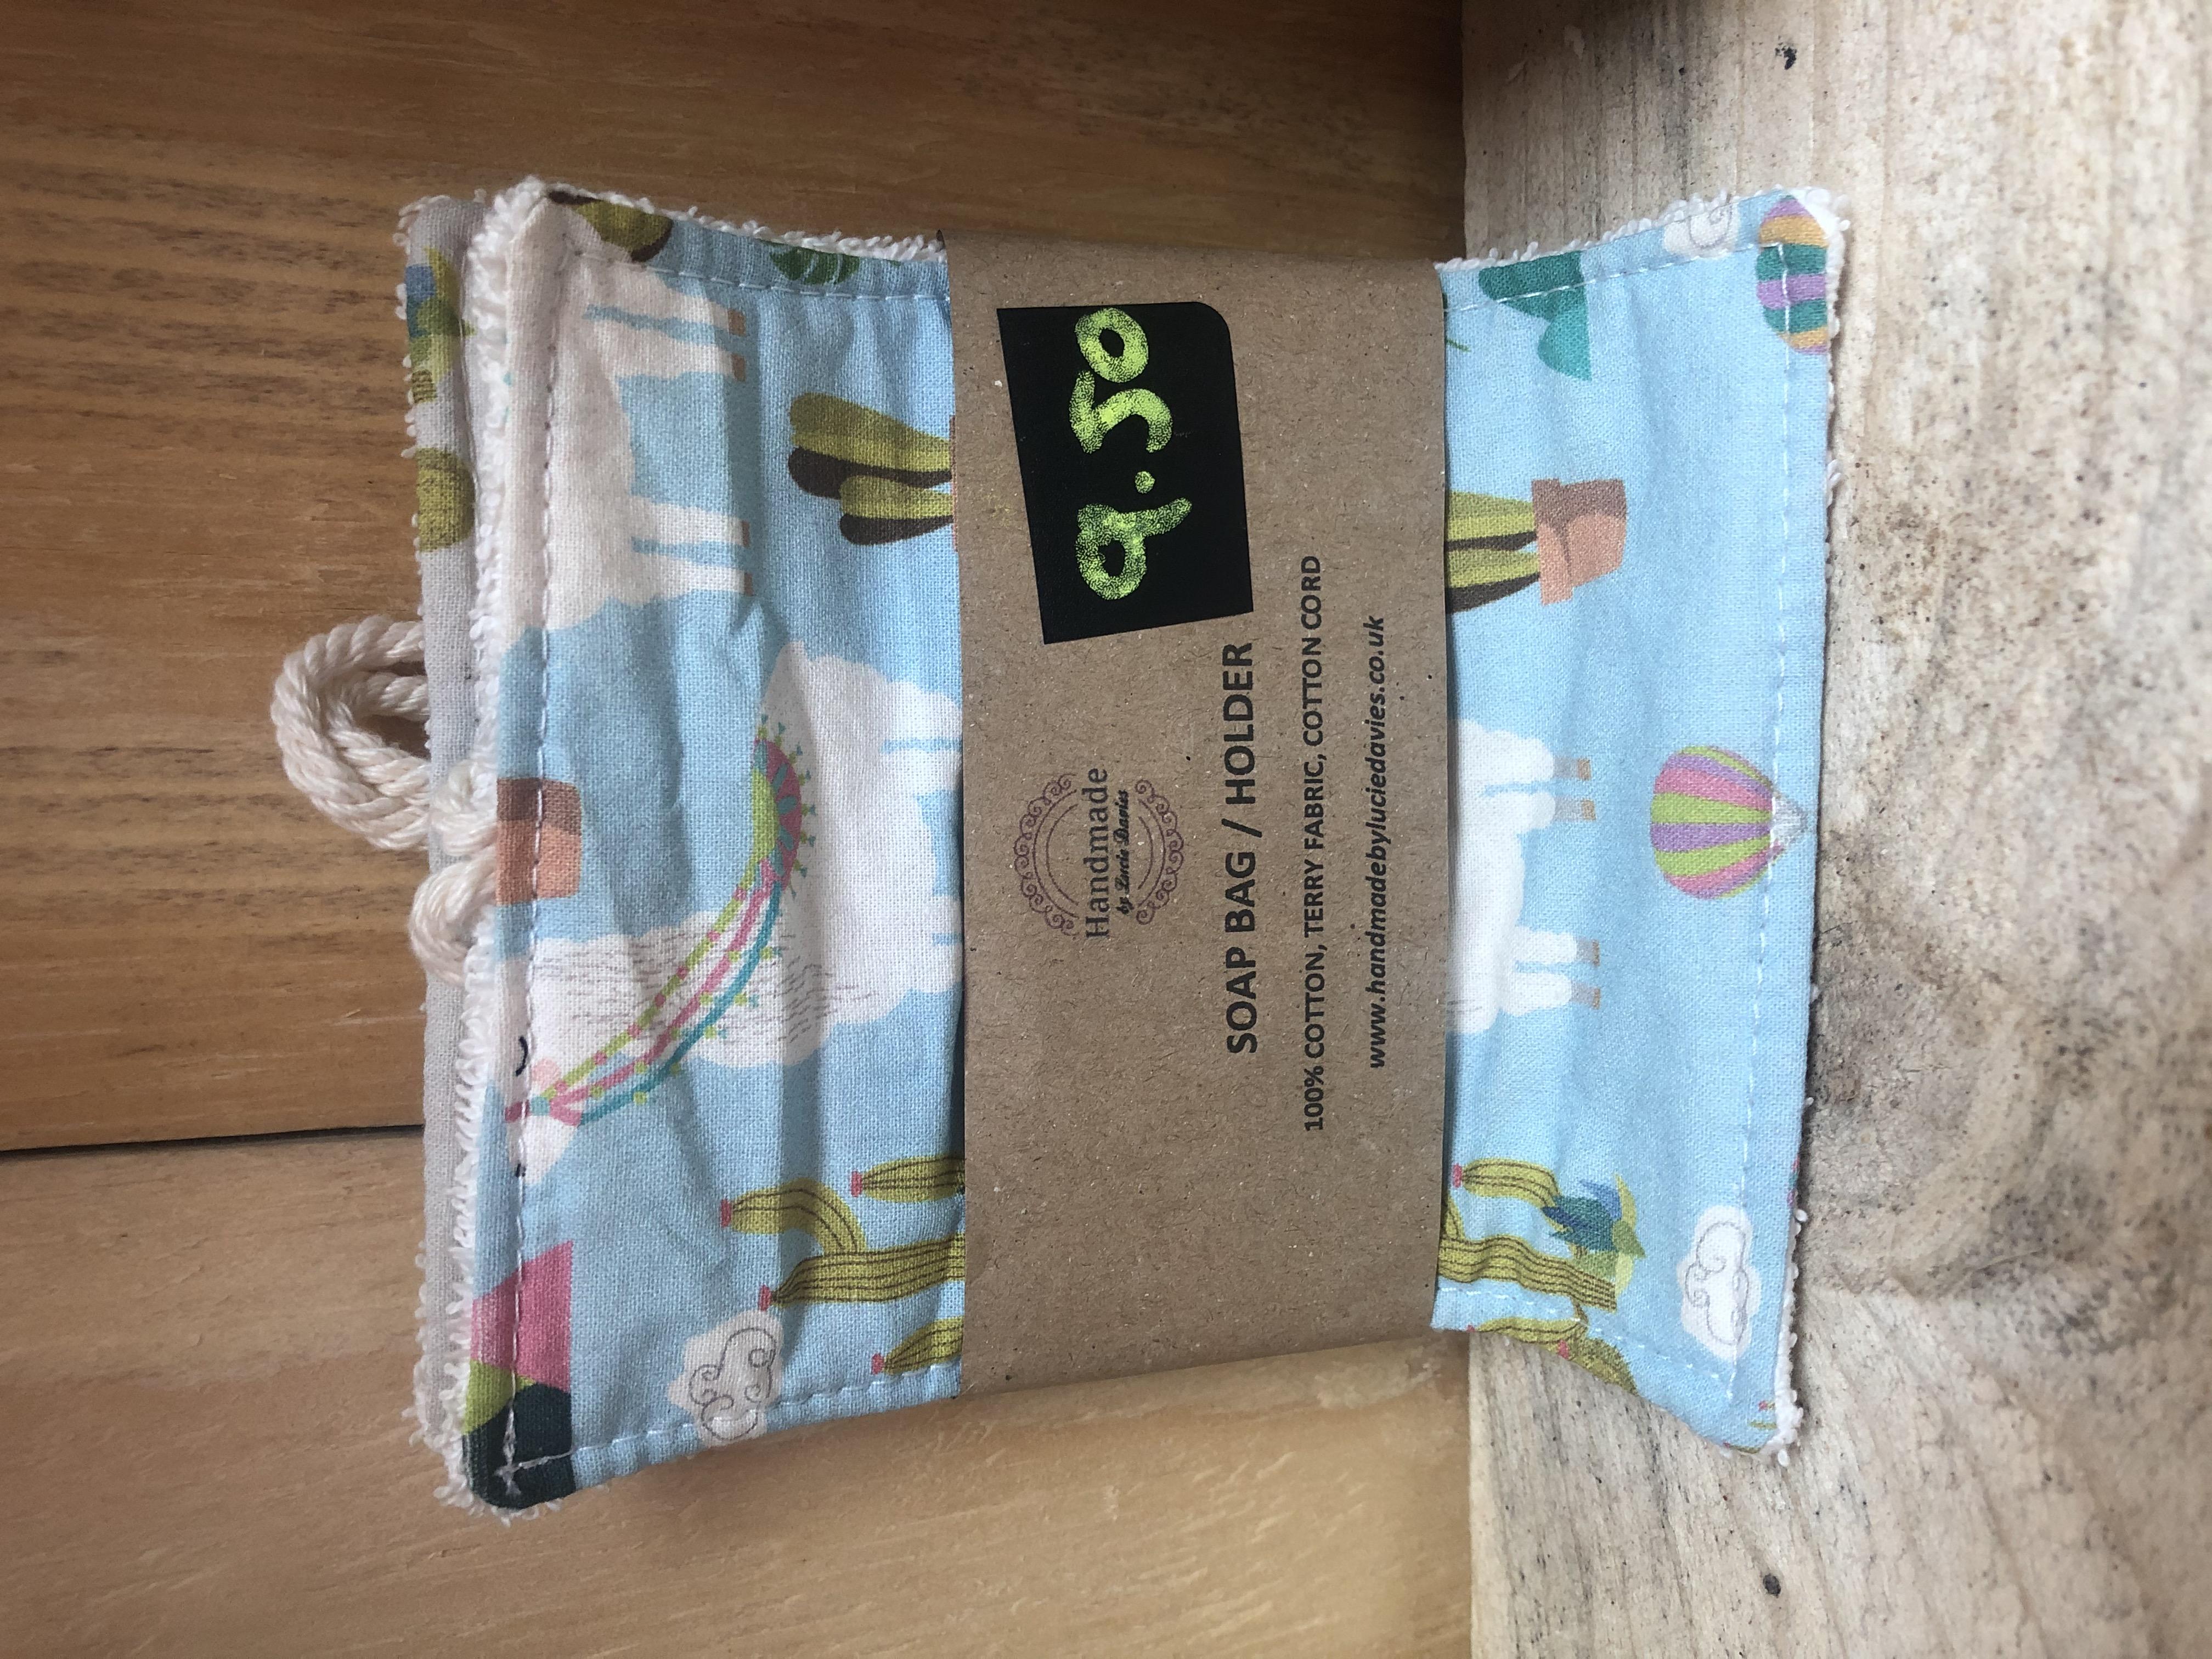 Soap Bag/Holder (Lucie Davies) (Various Designs)